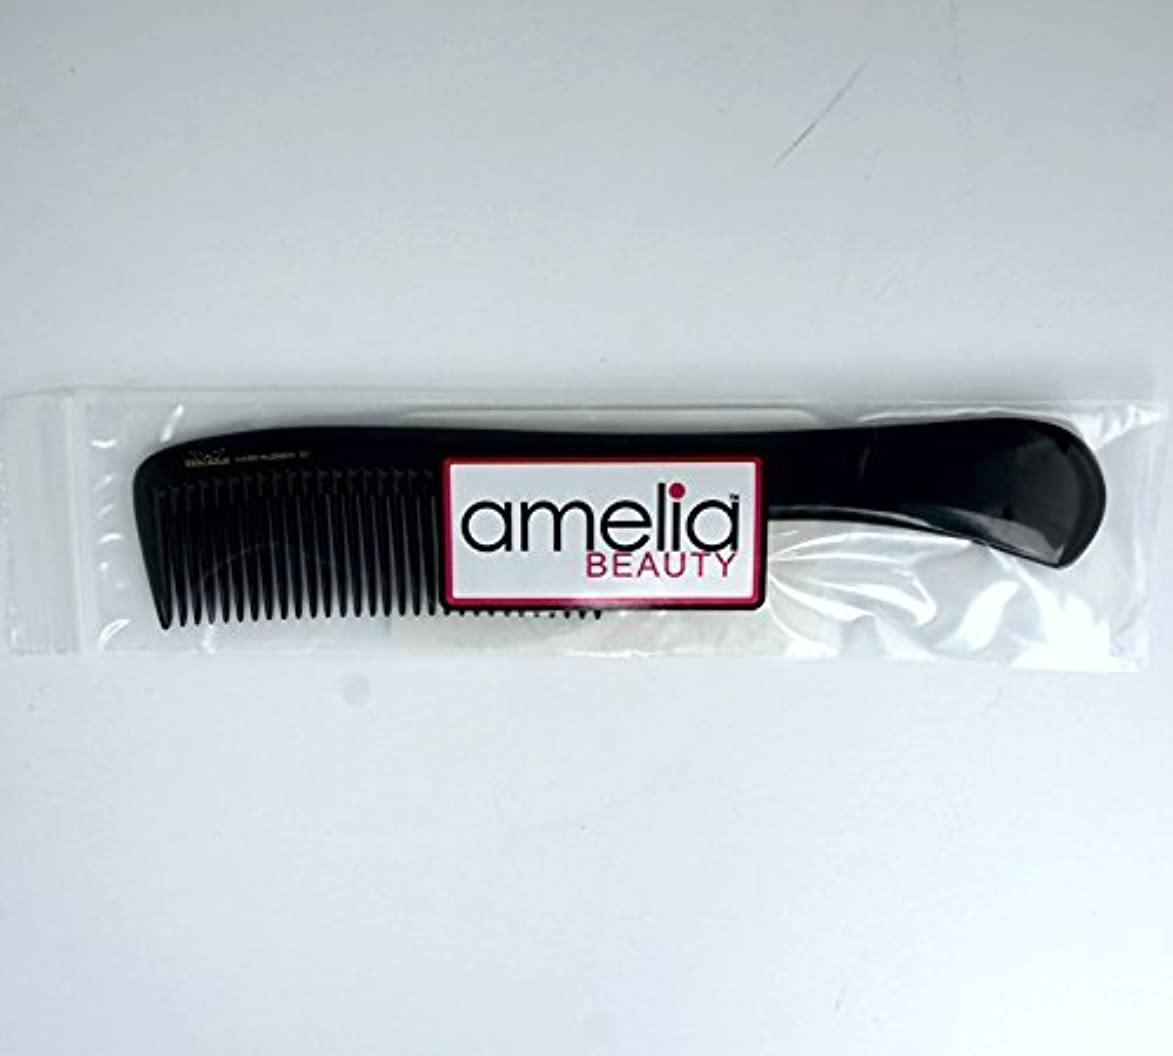 9in, Hard Rubber, Handle Comb [並行輸入品]